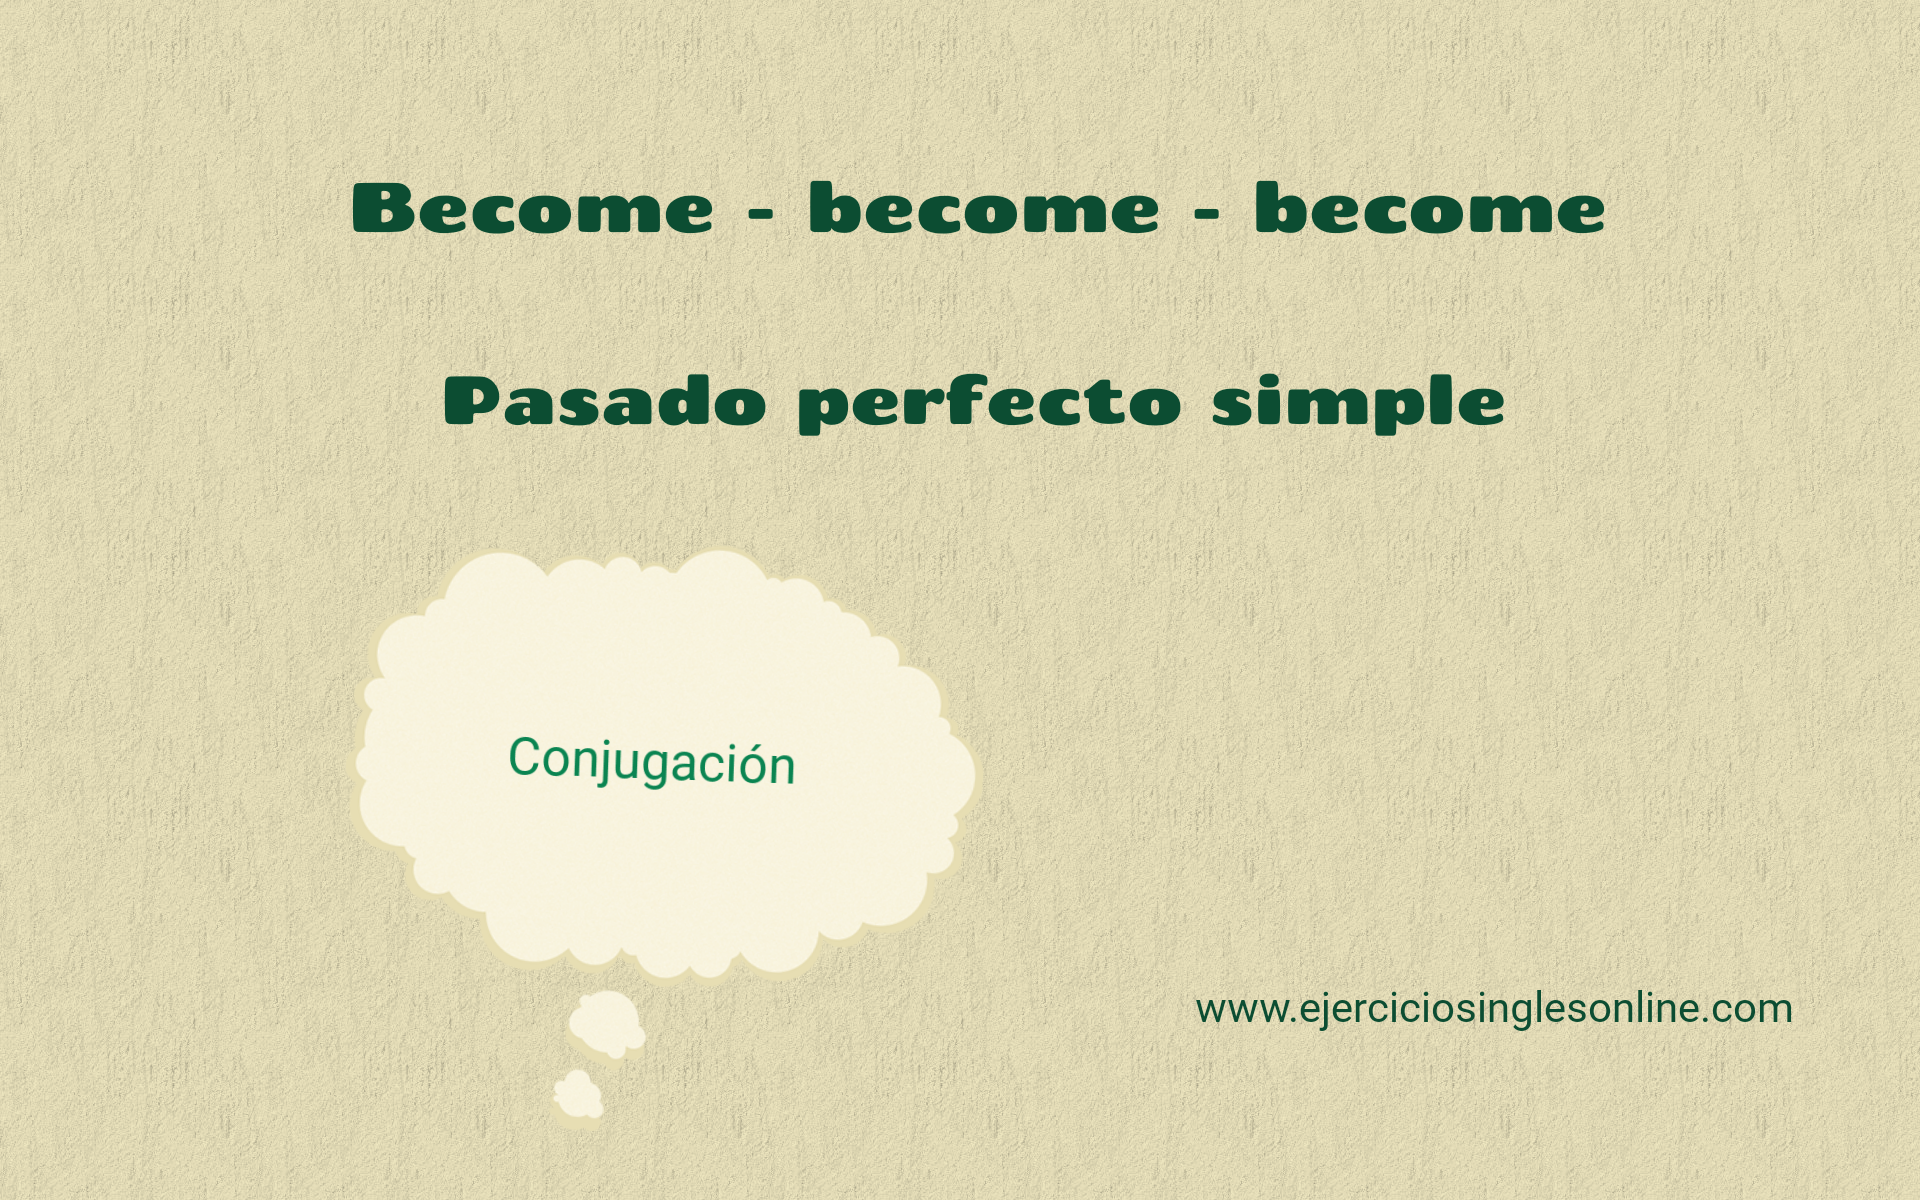 Become - Pasado perfecto simple